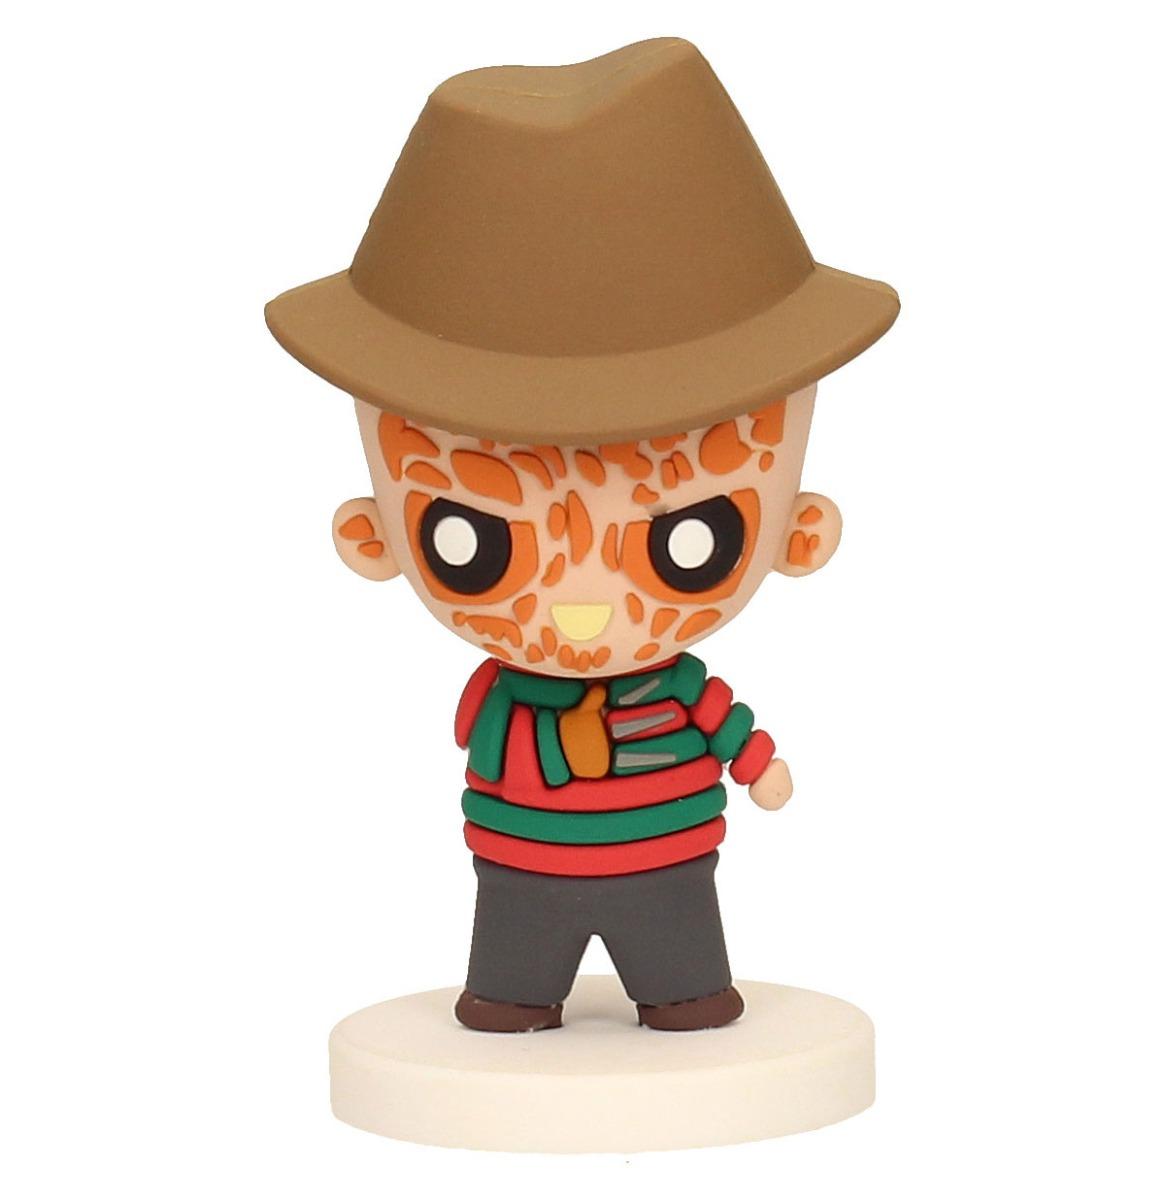 A Nightmare on Elm Street: Freddy Krueger Rubberen Figuur